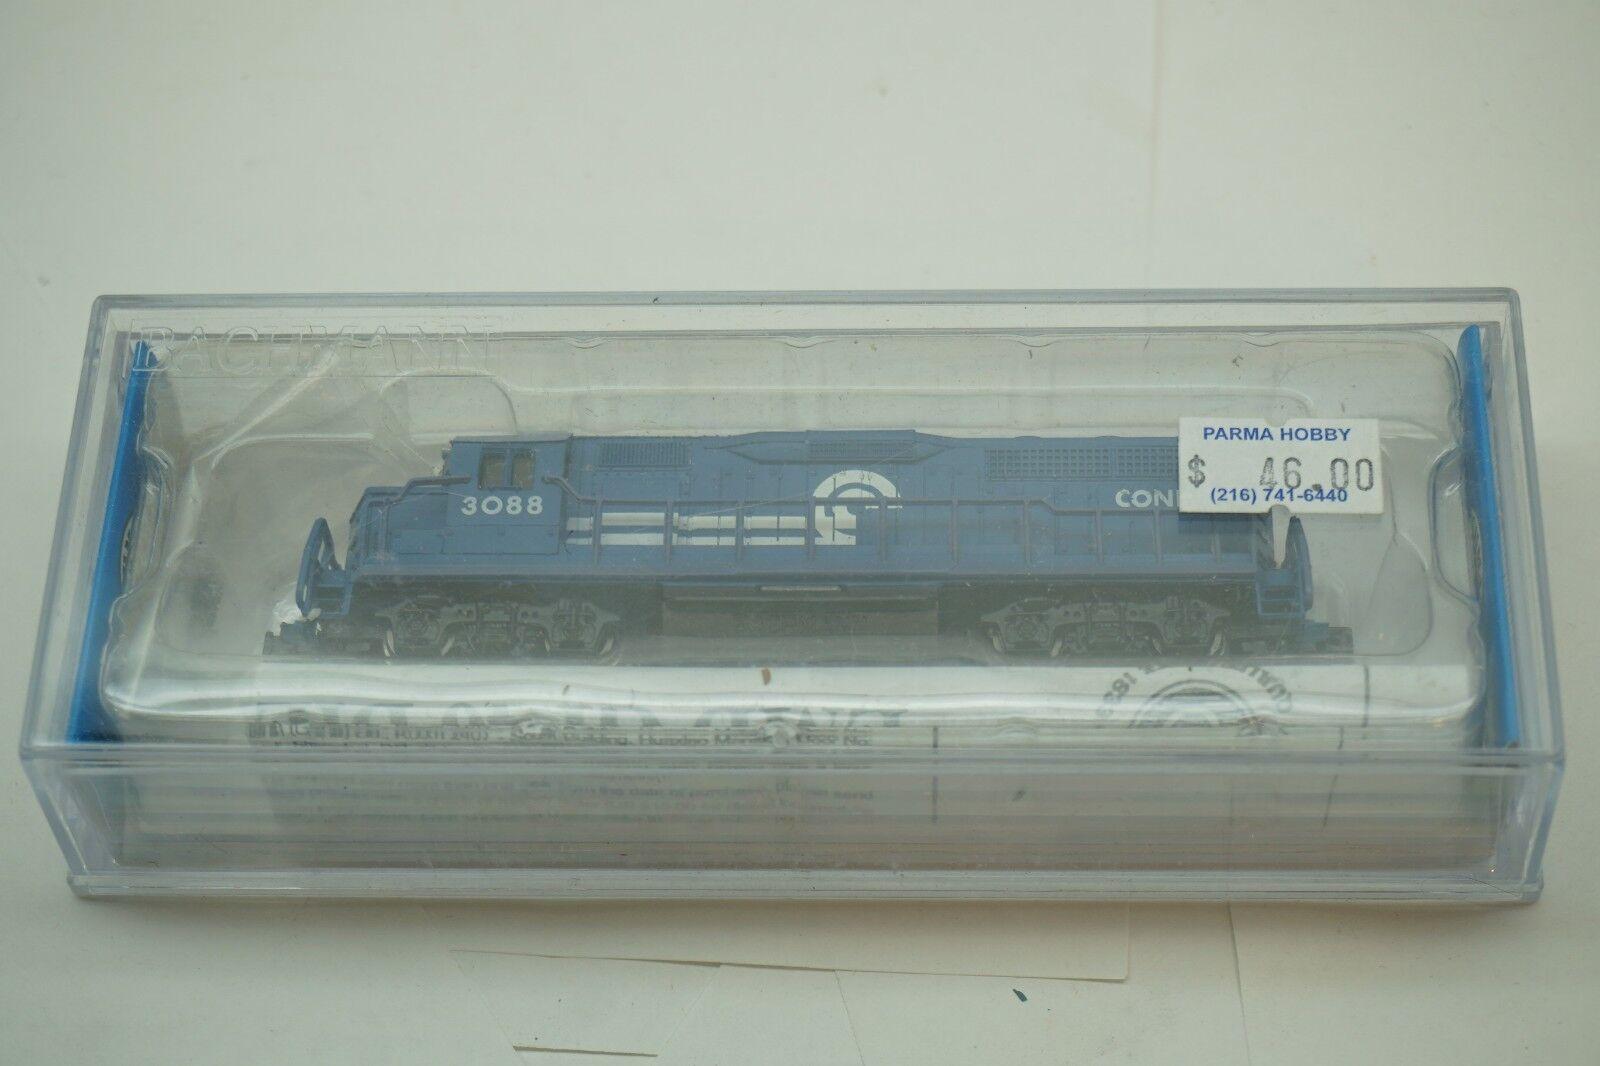 N SCALE TRAIN CONRAIL GP40 DIESEL LOCOMOTIVE BACHMANN ENGINE 63556 3088 BOX